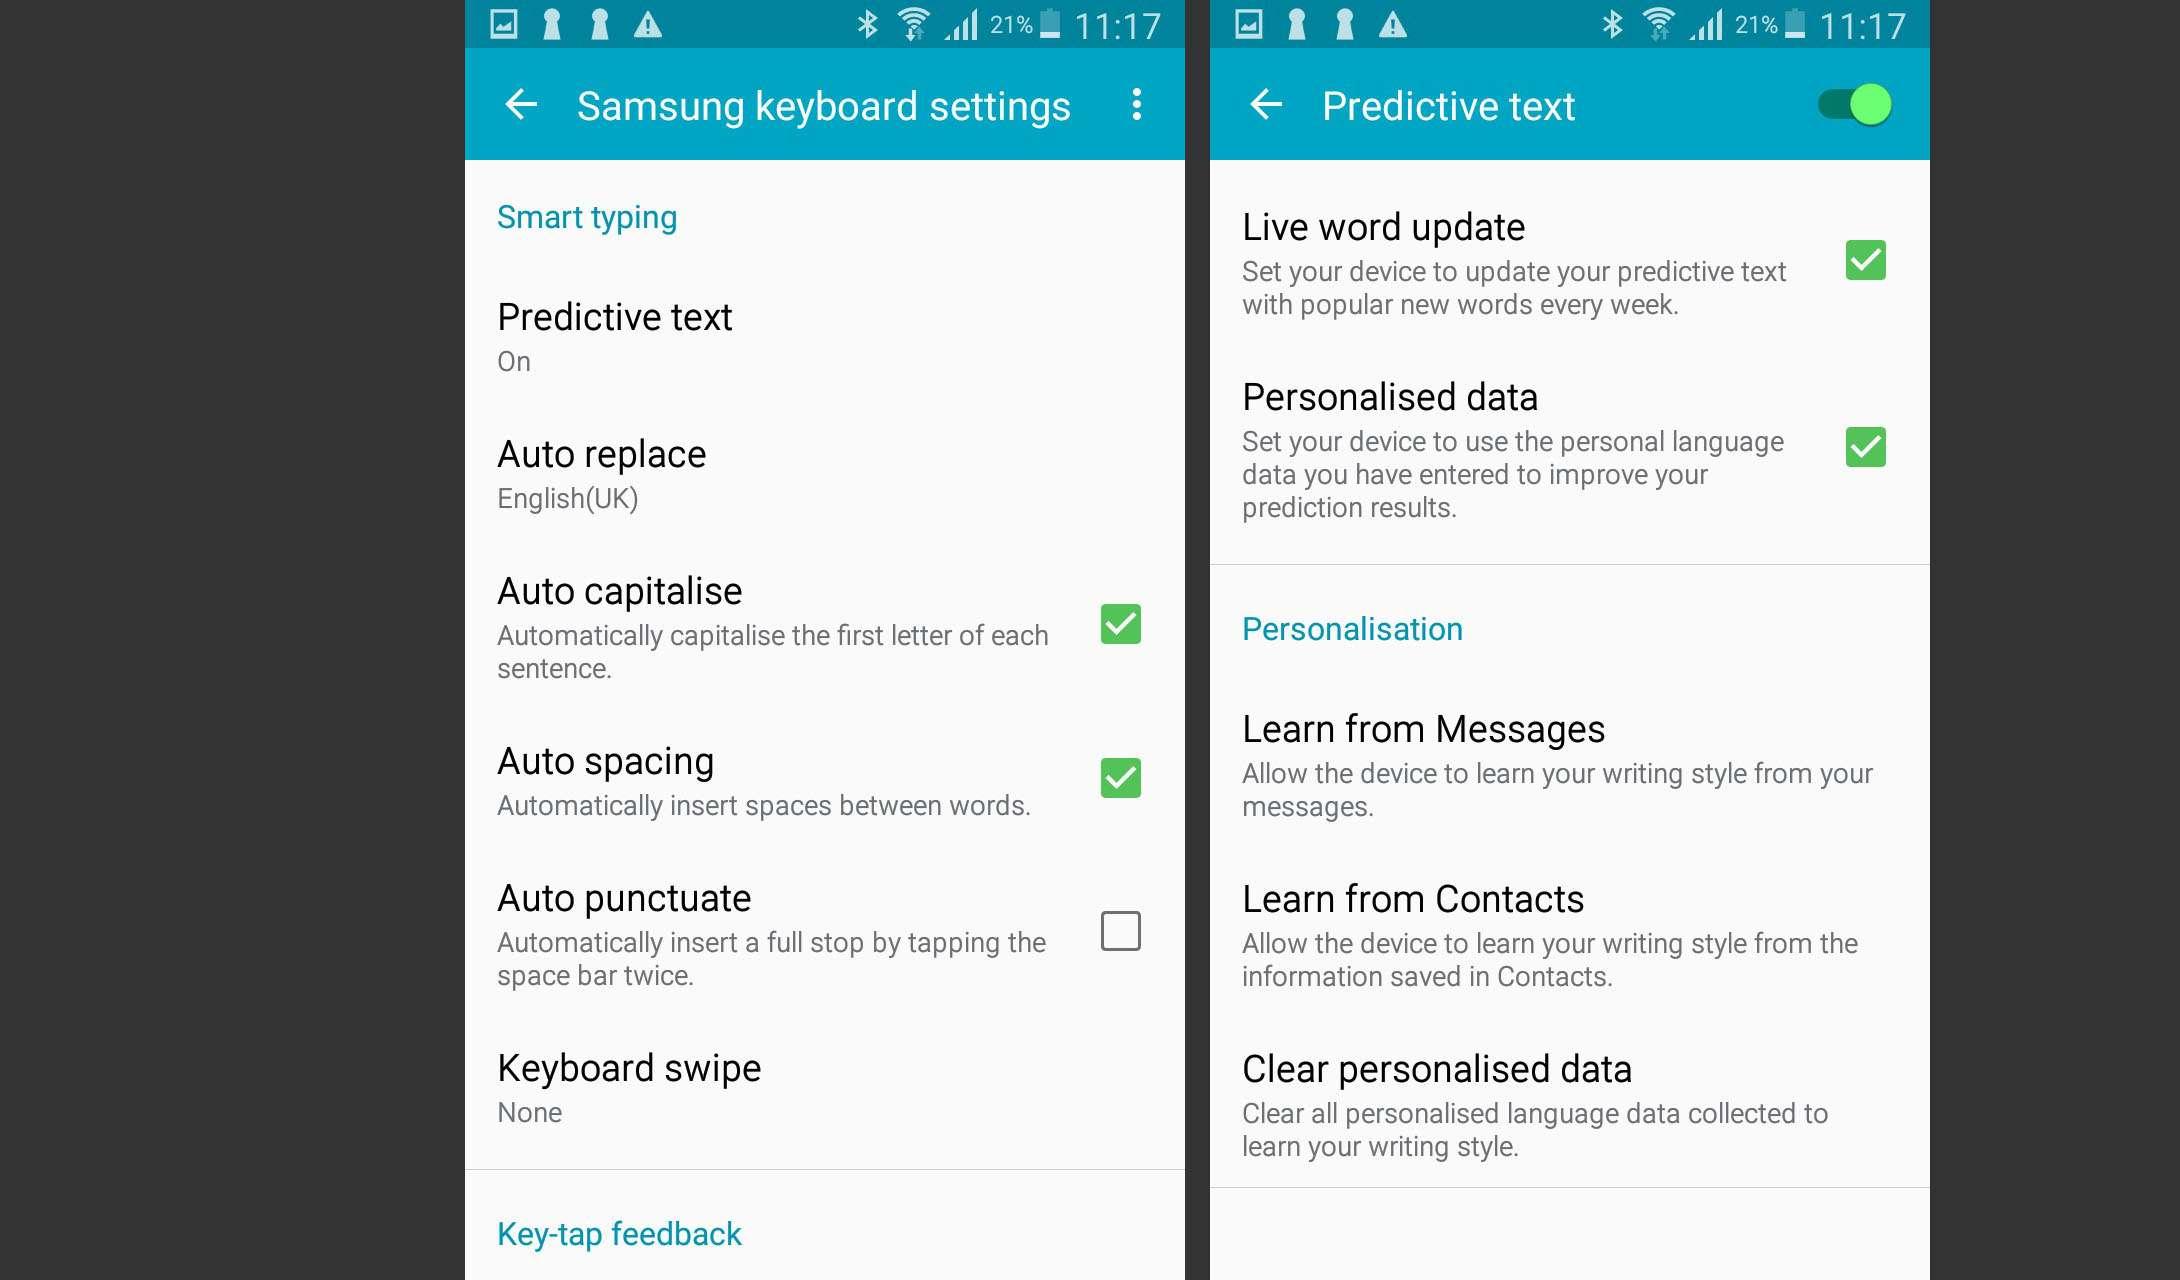 Samsung Keyboard Settings and Predictive Text Settings